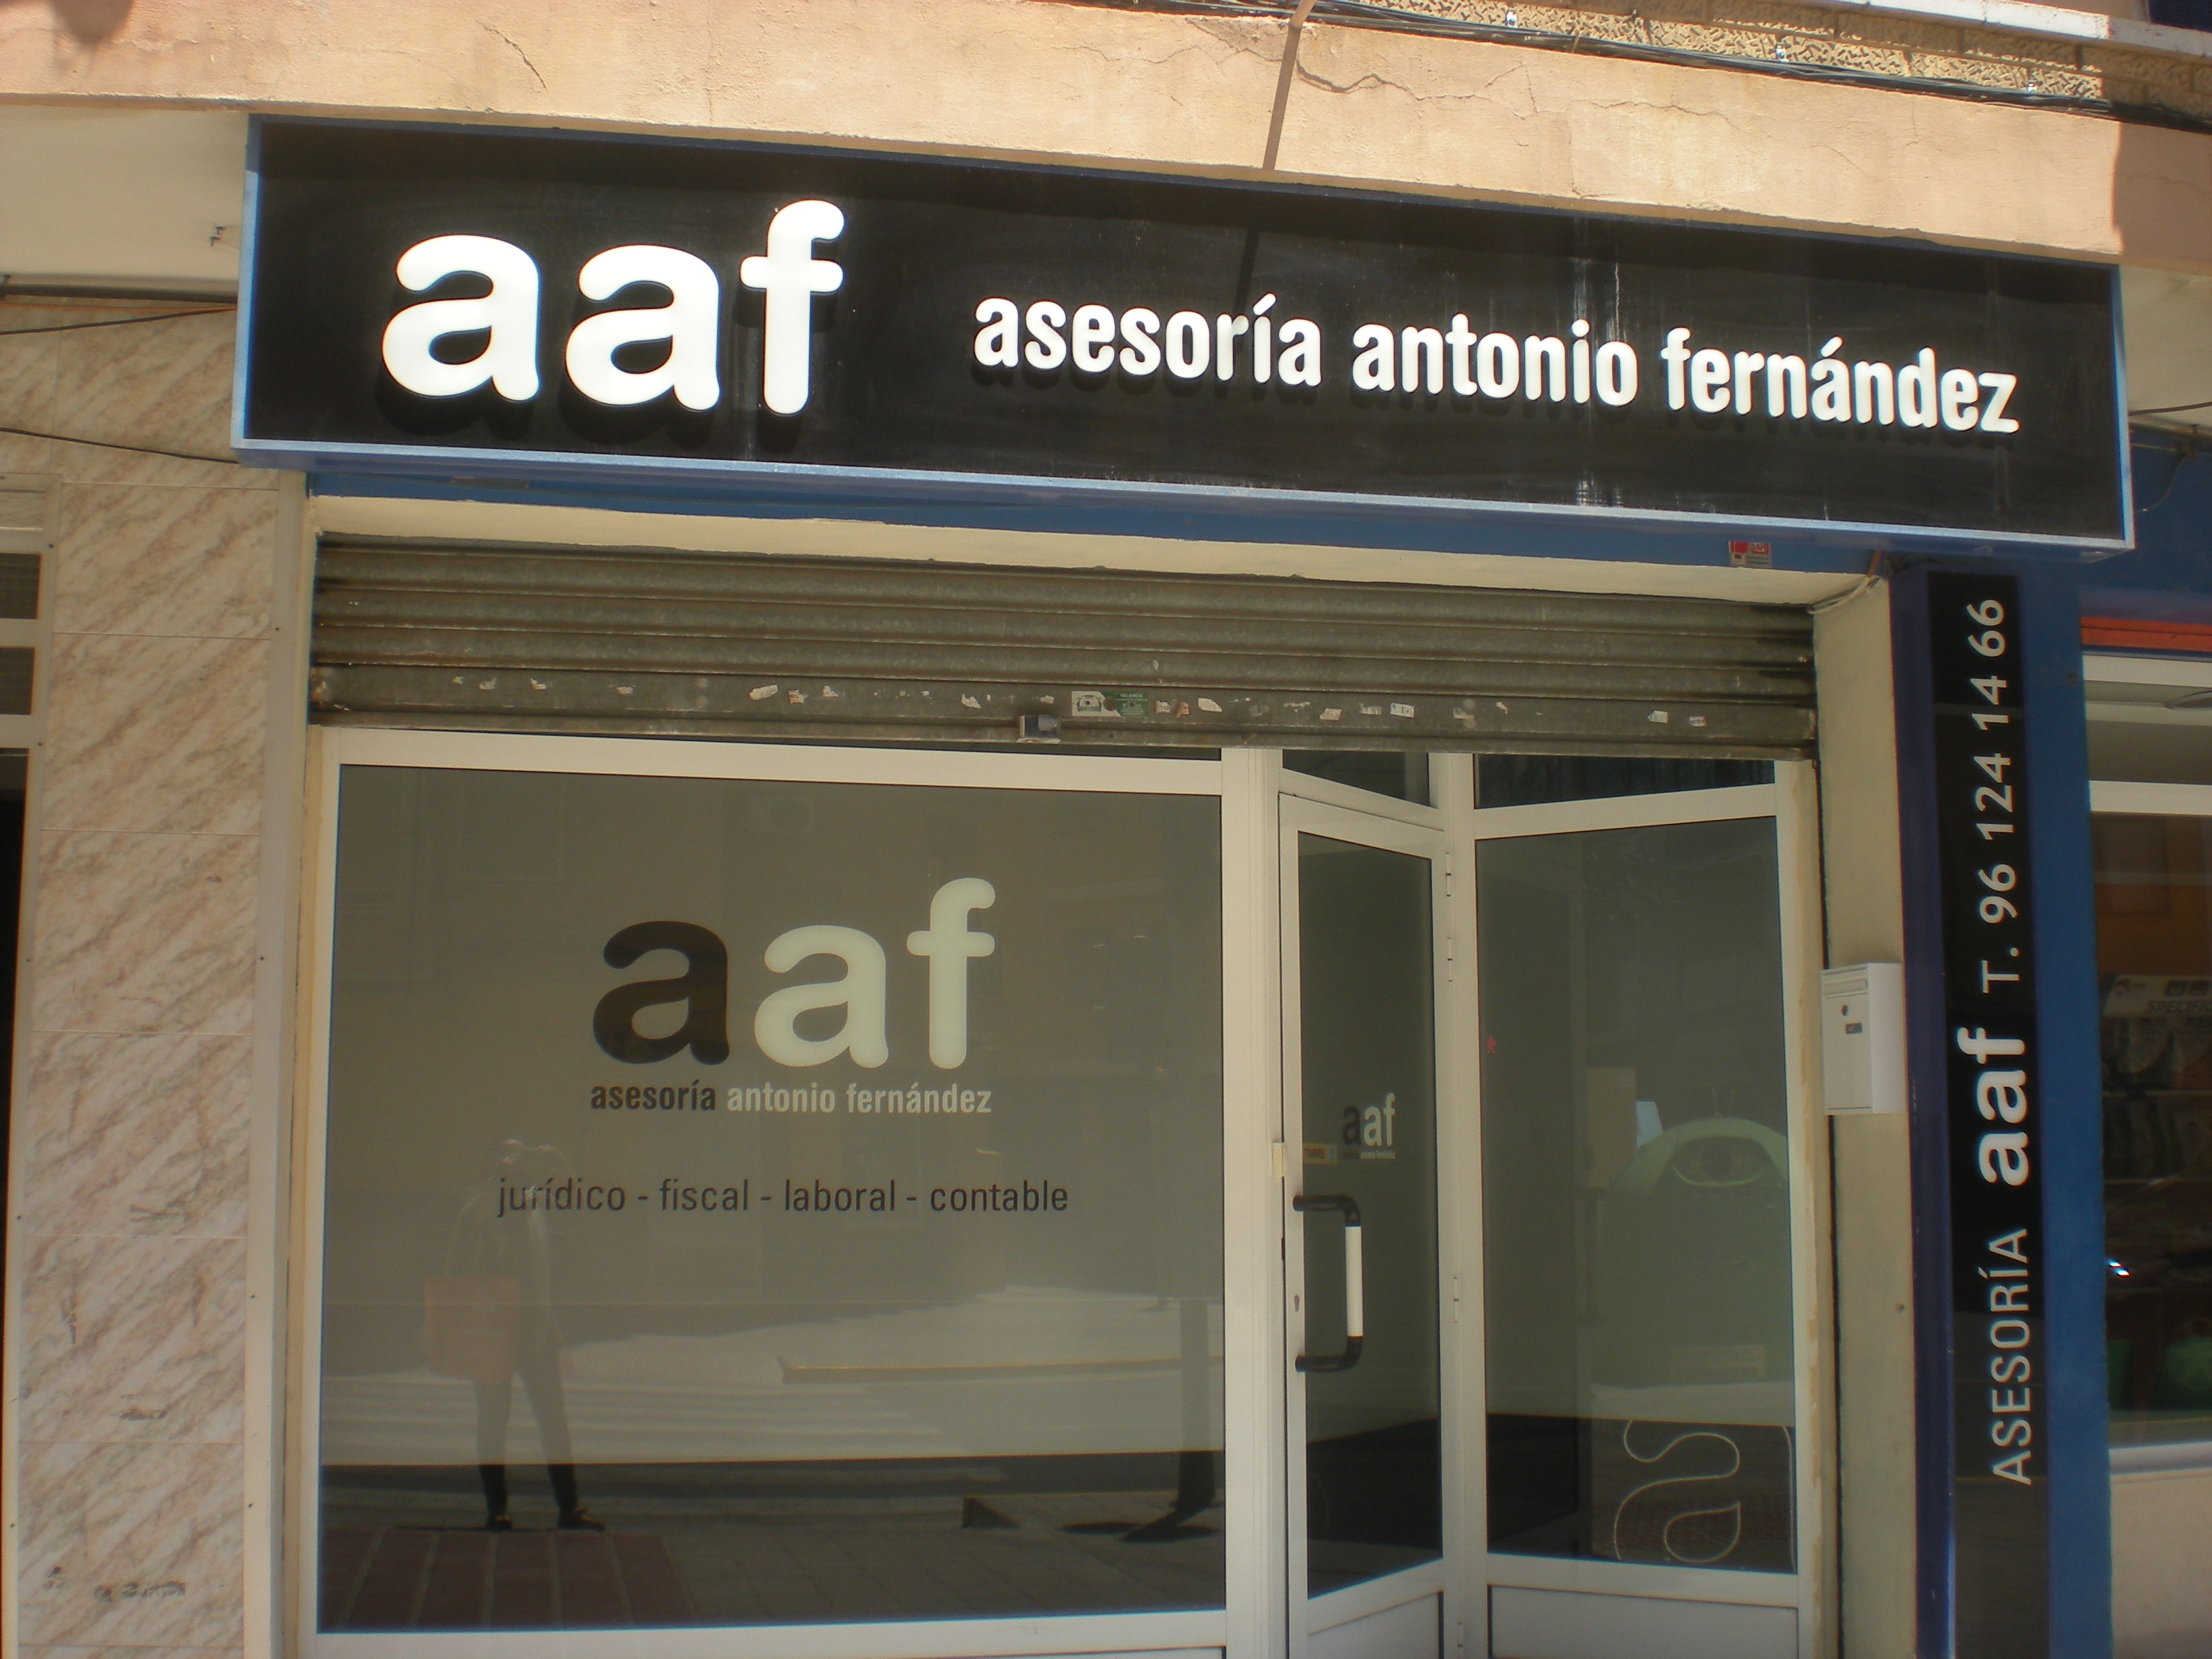 ASESORIA ANTONIO FERNANDEZ